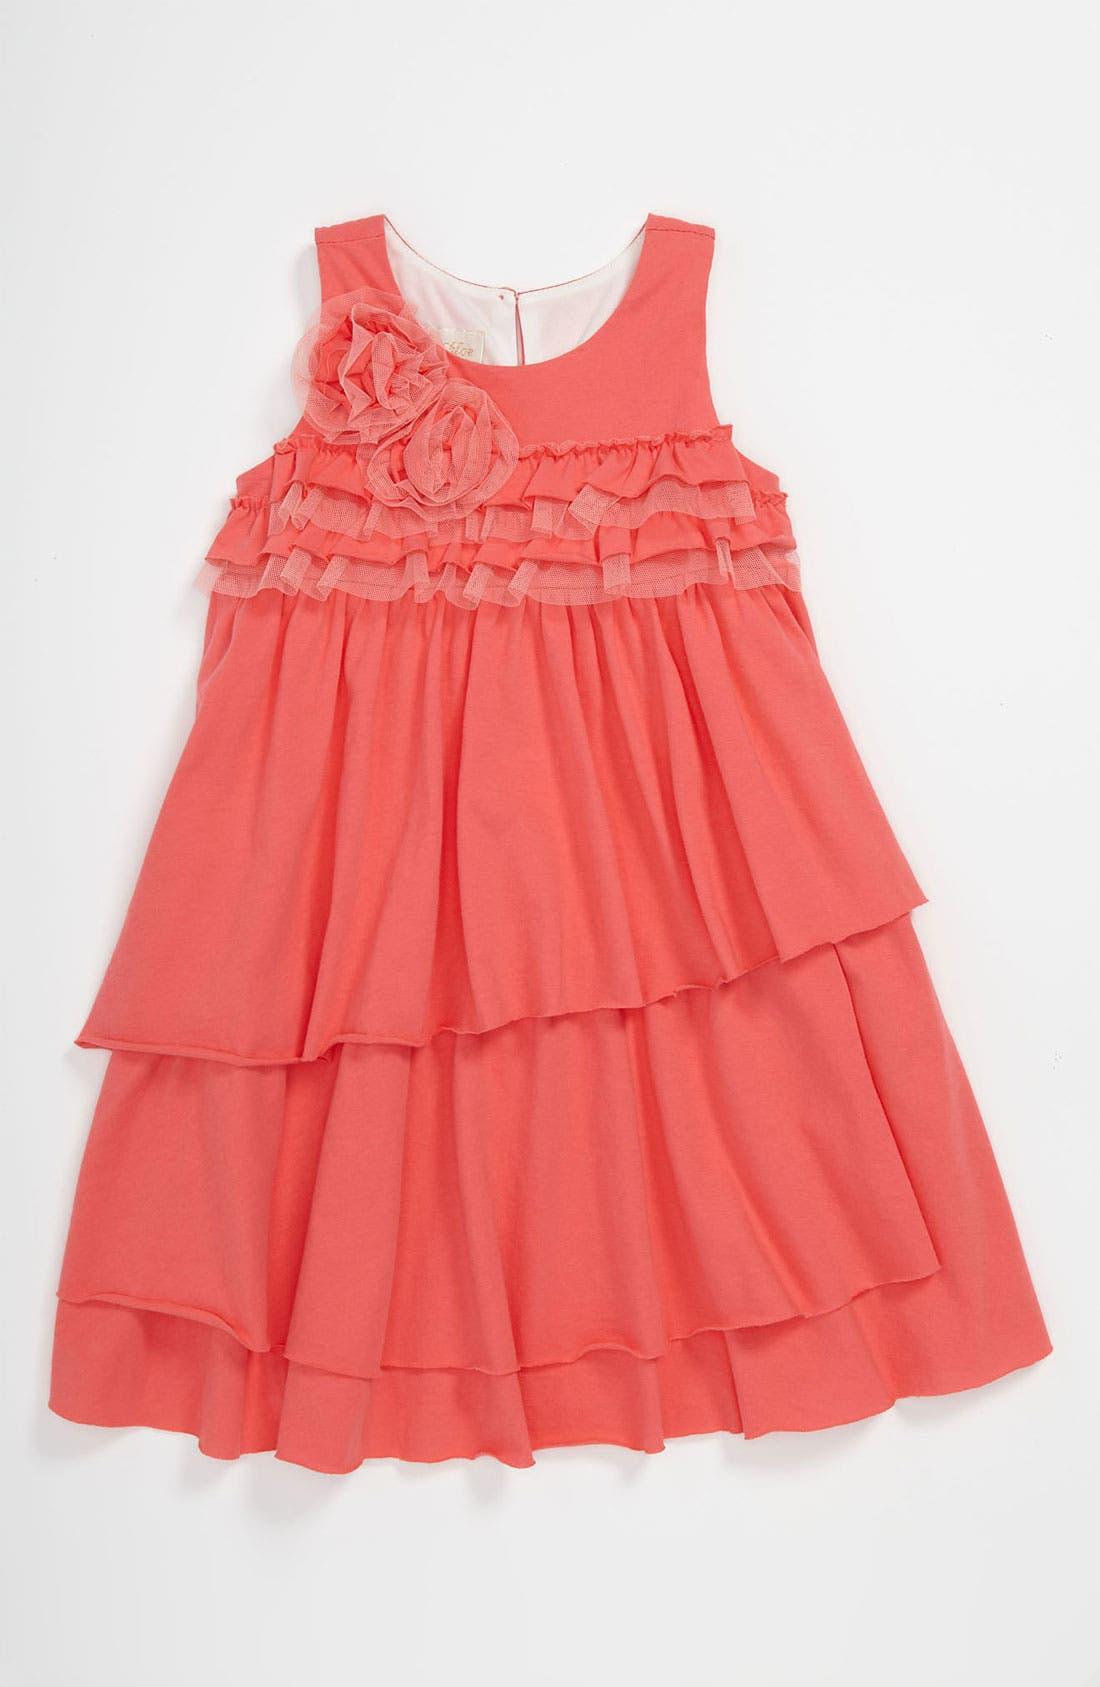 Alternate Image 1 Selected - Isobella & Chloe 'Jenny' Dress (Toddler)